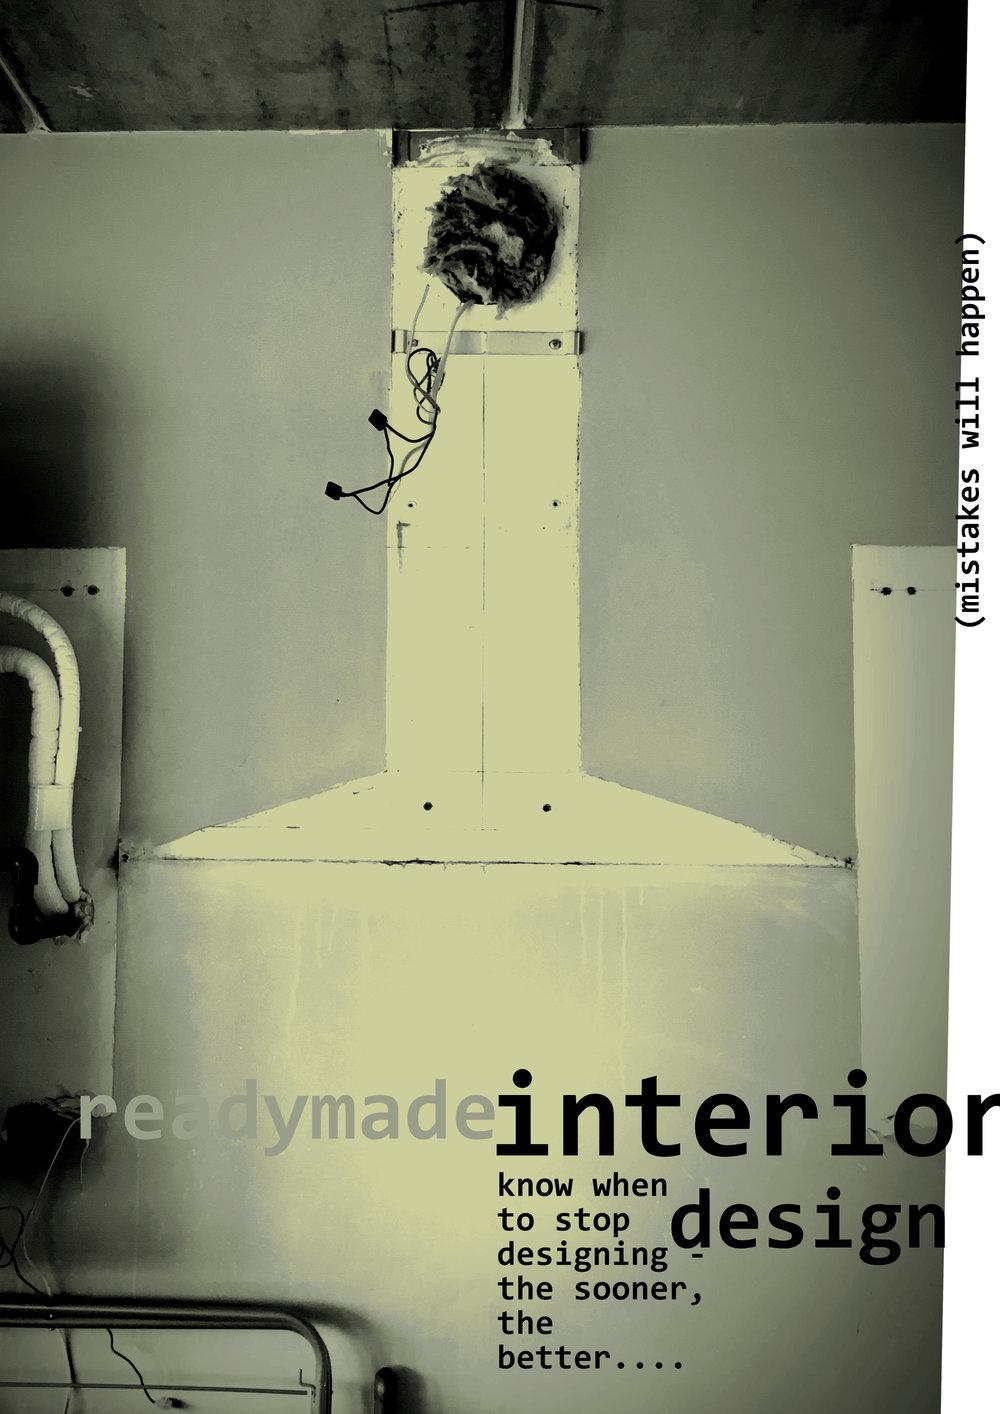 readymadeinteriordesignposter_001.jpg